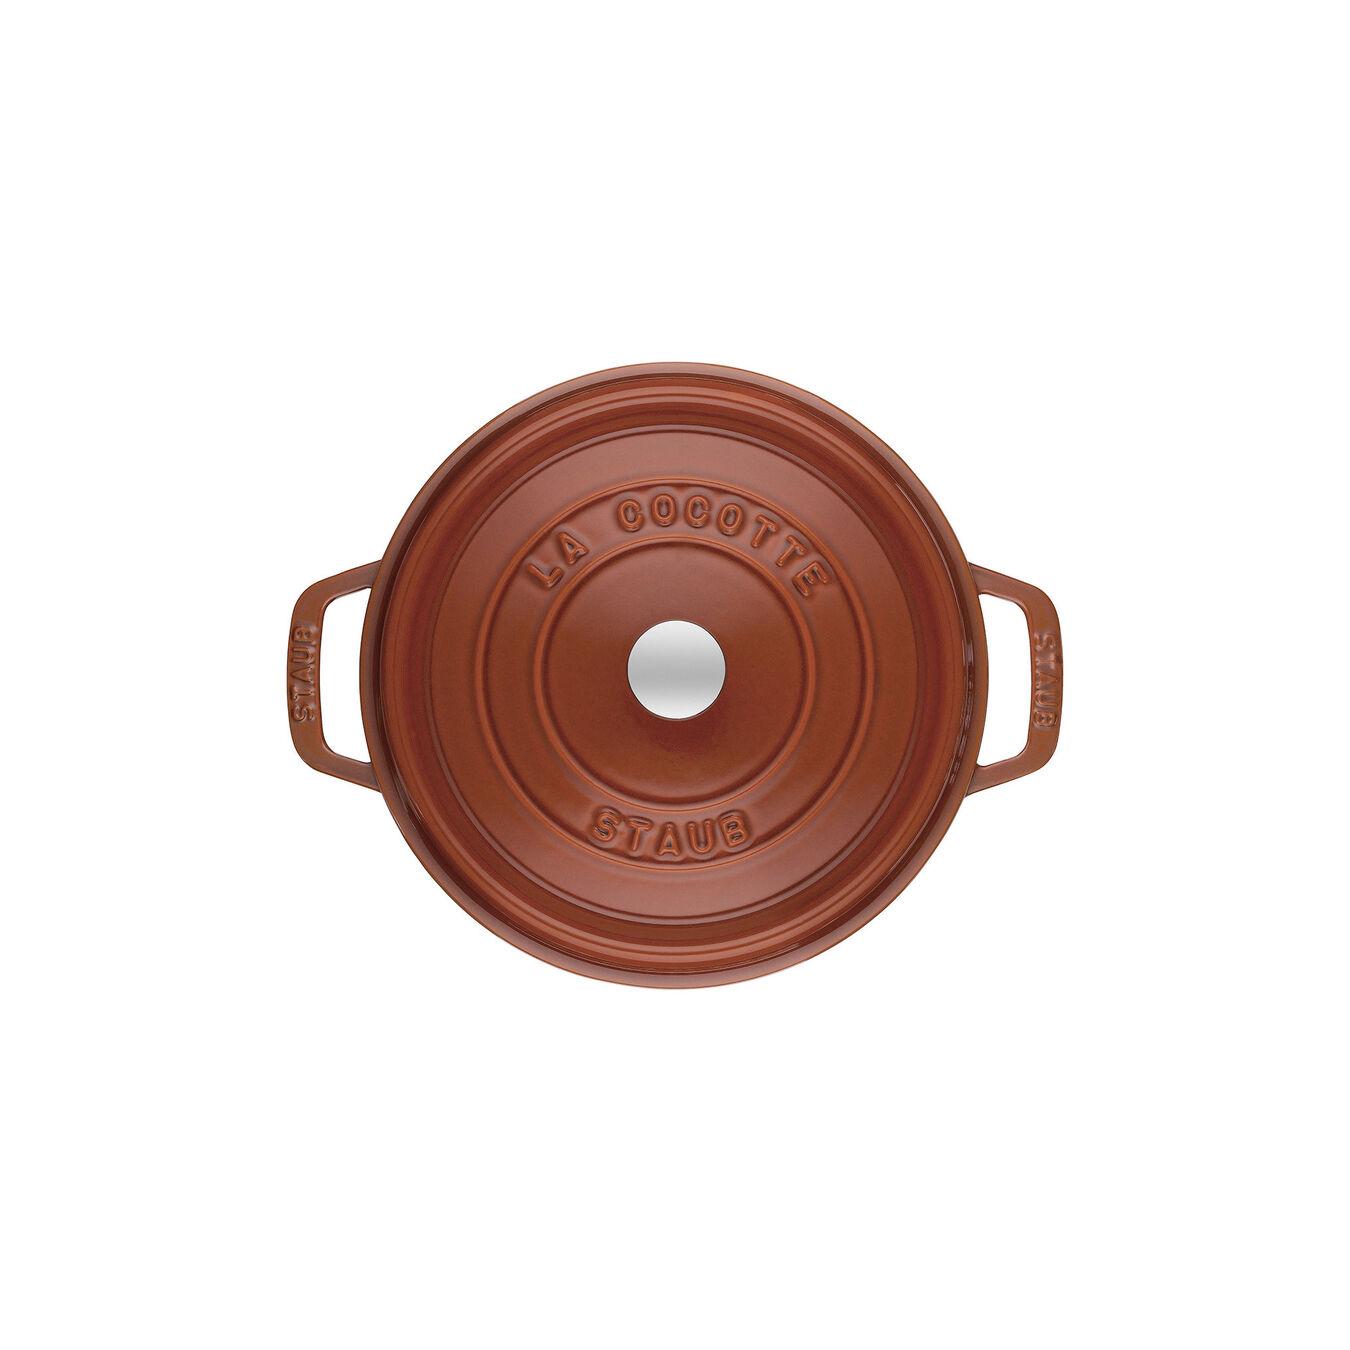 2.75-qt Round Cocotte - Burnt Orange,,large 2